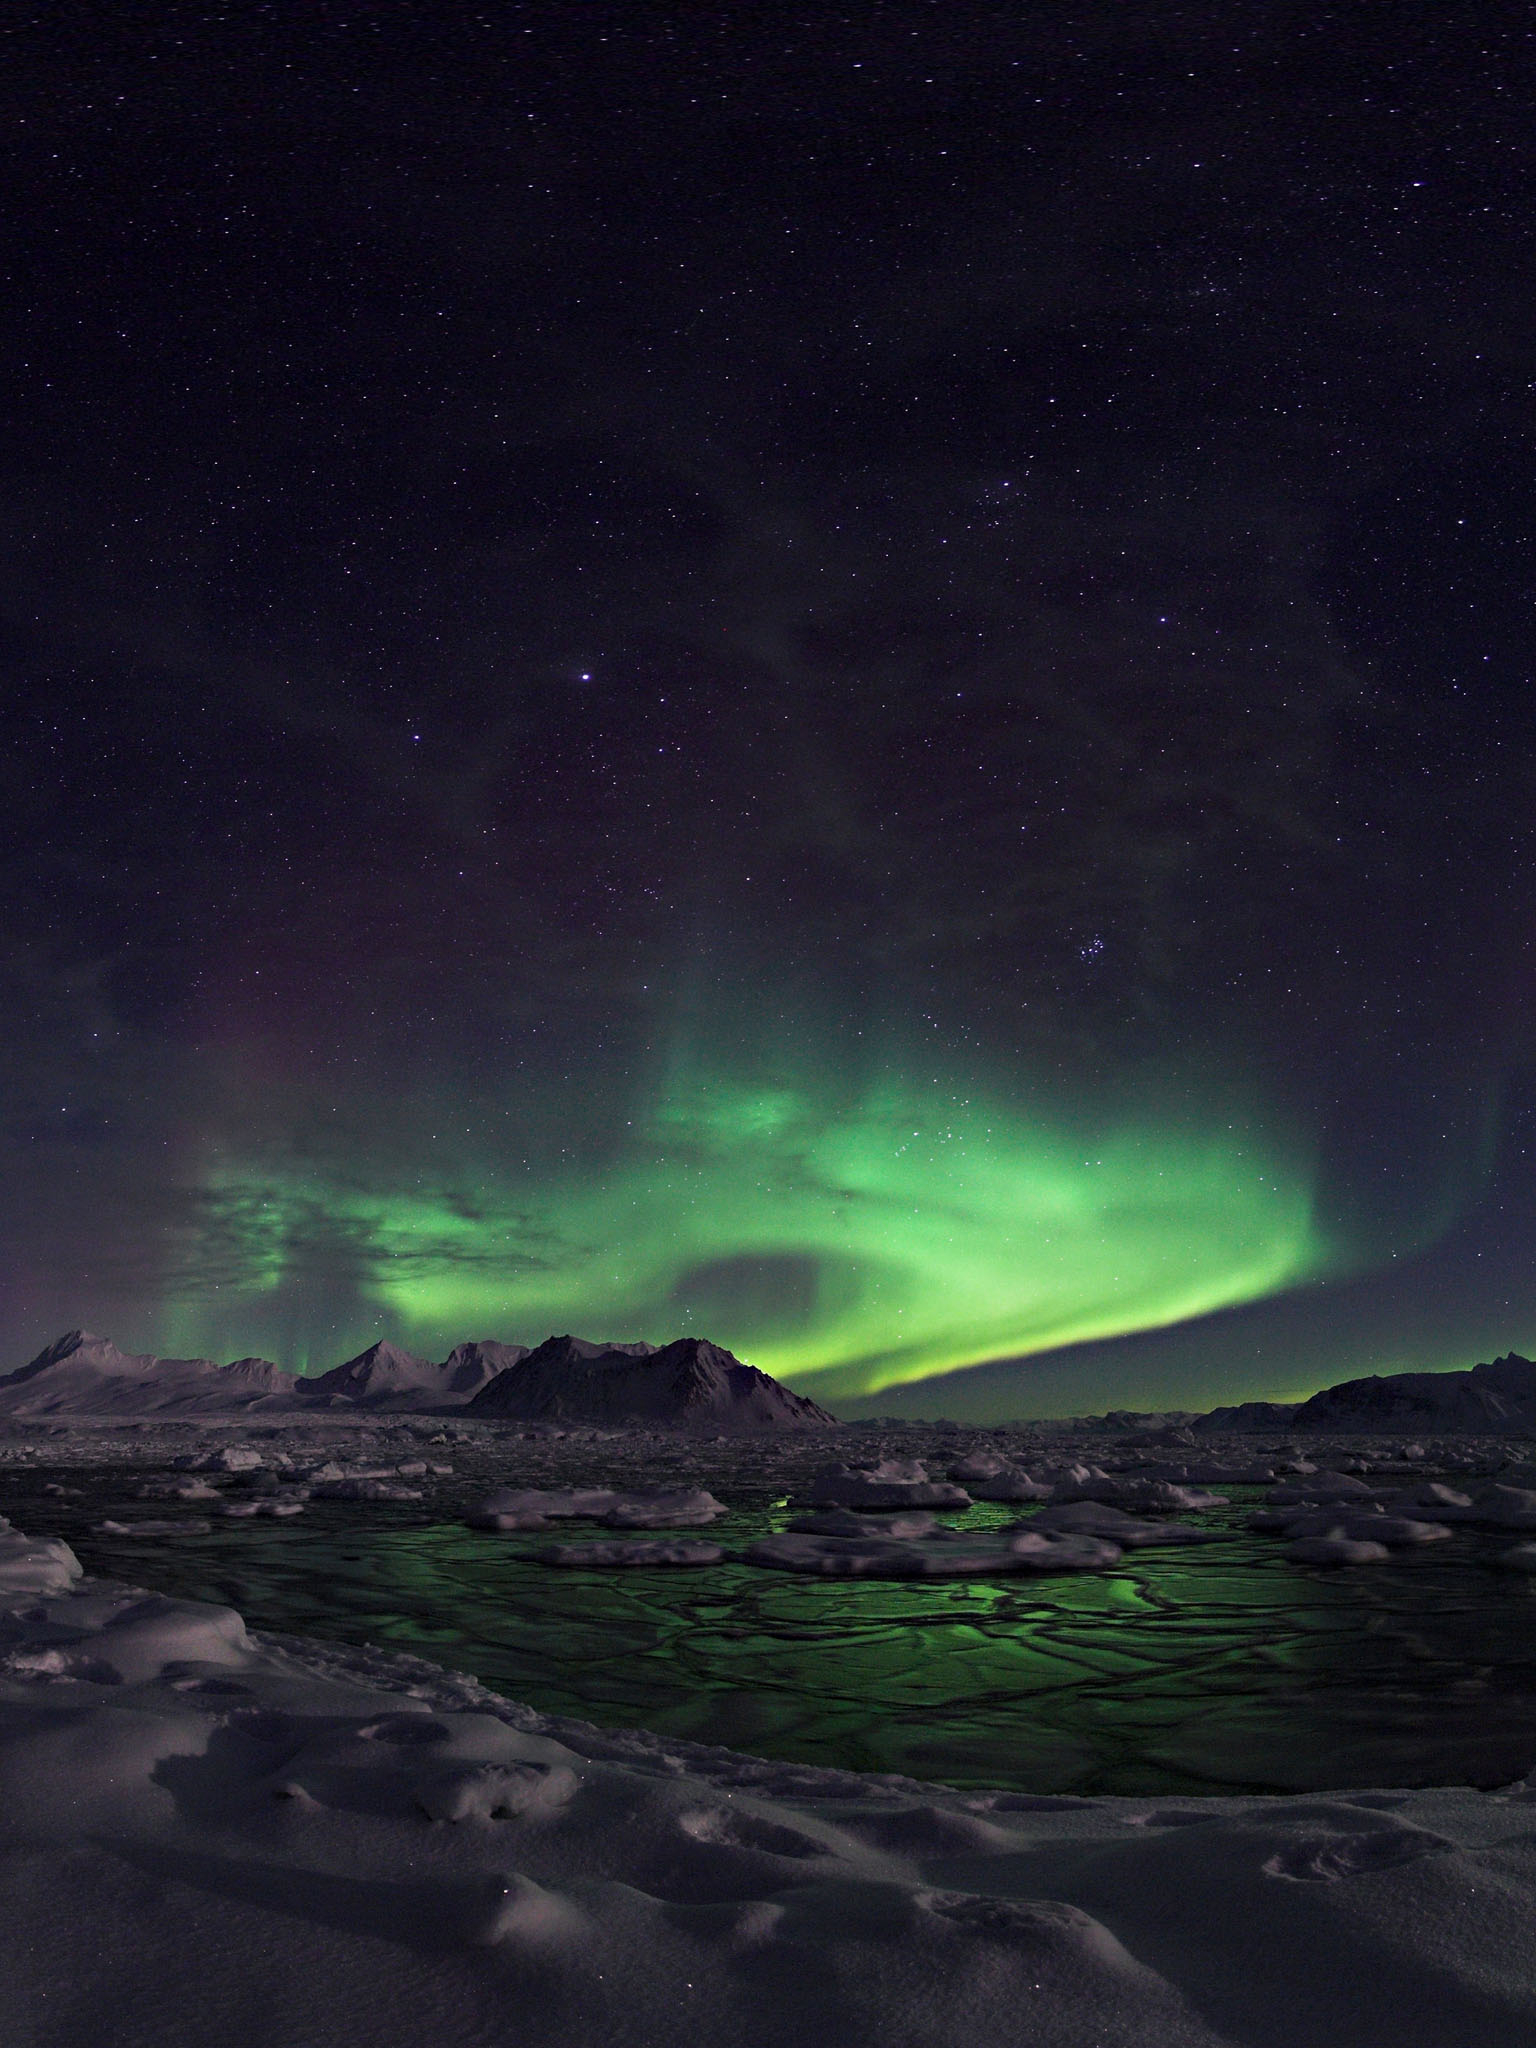 Free Download Northern Lights Wallpaper 12037 Wallpaper Res